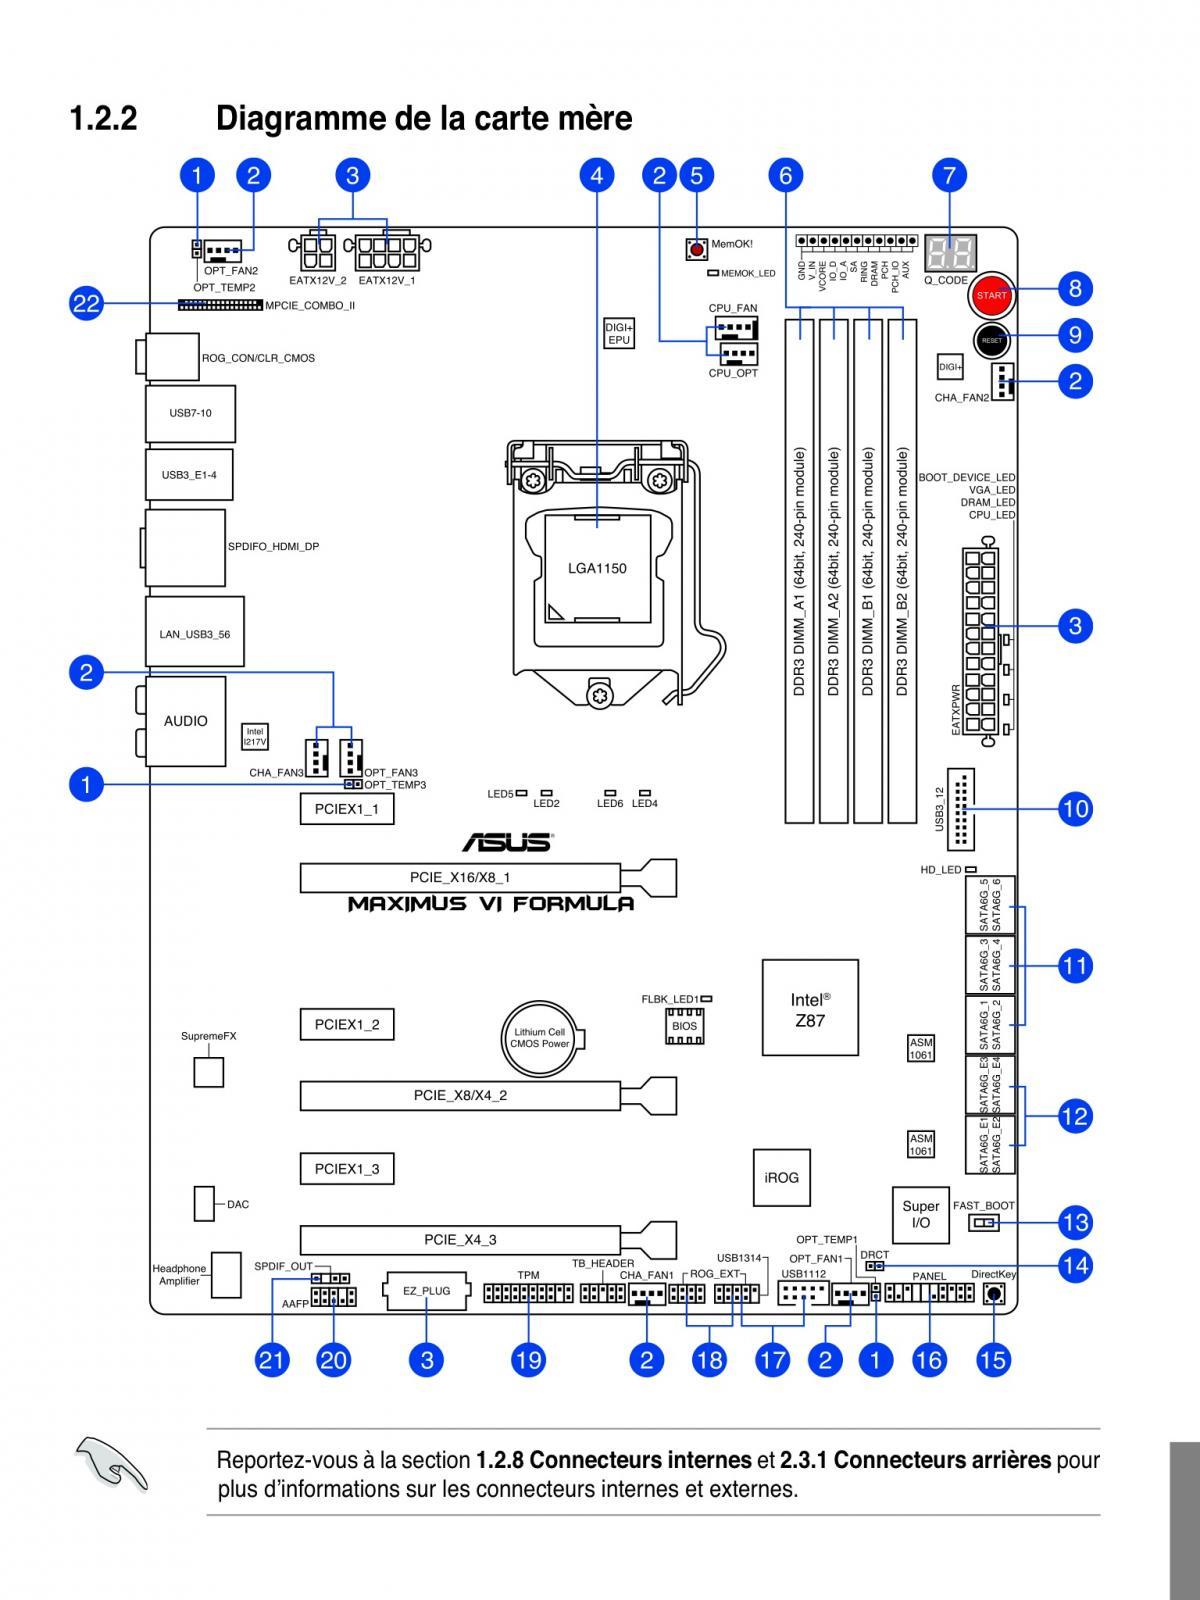 ASUS Maximus VI Formula C2 missing fan in AIDA64 - Hardware